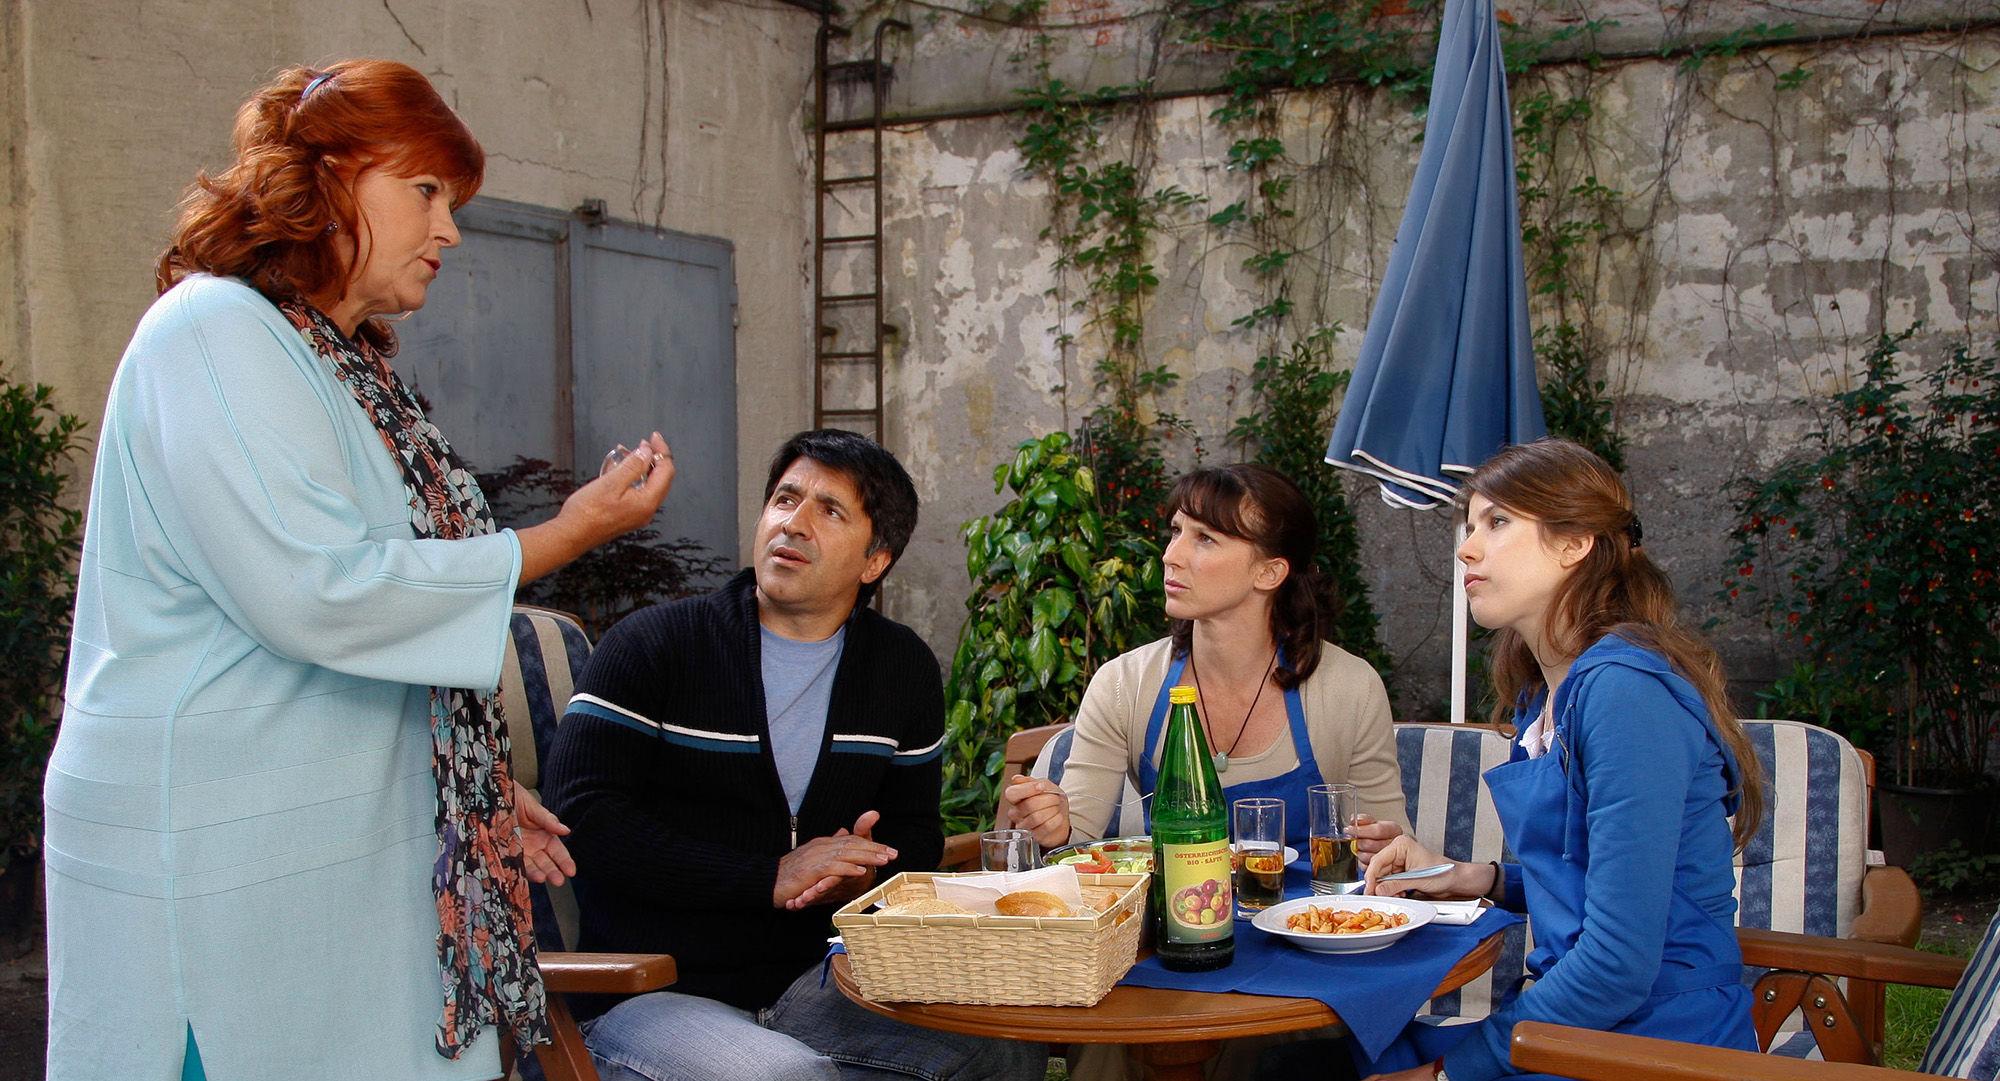 Elfi Eschke (Sarah Horrowitz), Haydar Zorlu (Seyfi Ülbül), Maria Köstlinger (Anna Schnabel), Nora Heschl (Judith Schnabel)